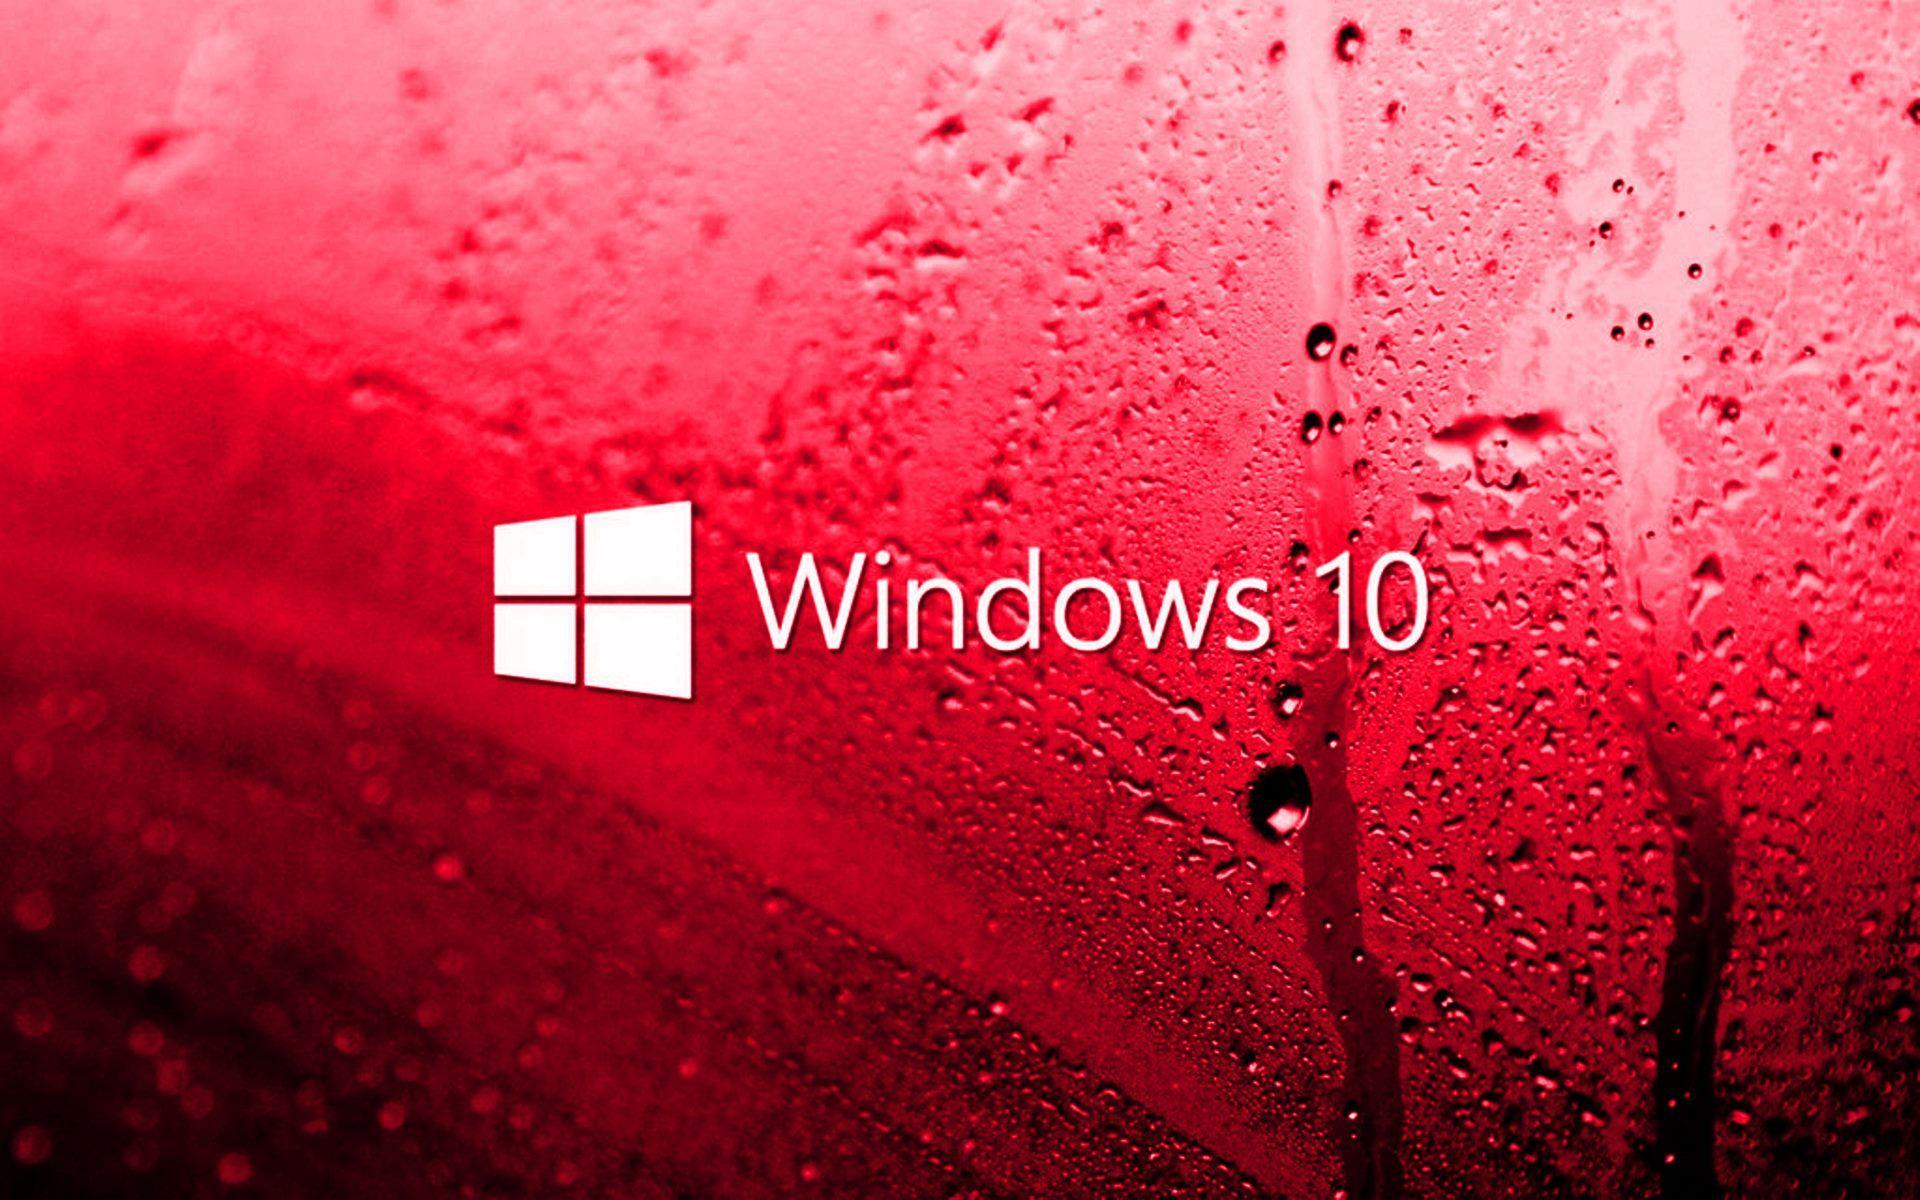 lock screen wallpapers hd for windows 10,red,water,pink,moisture,drop